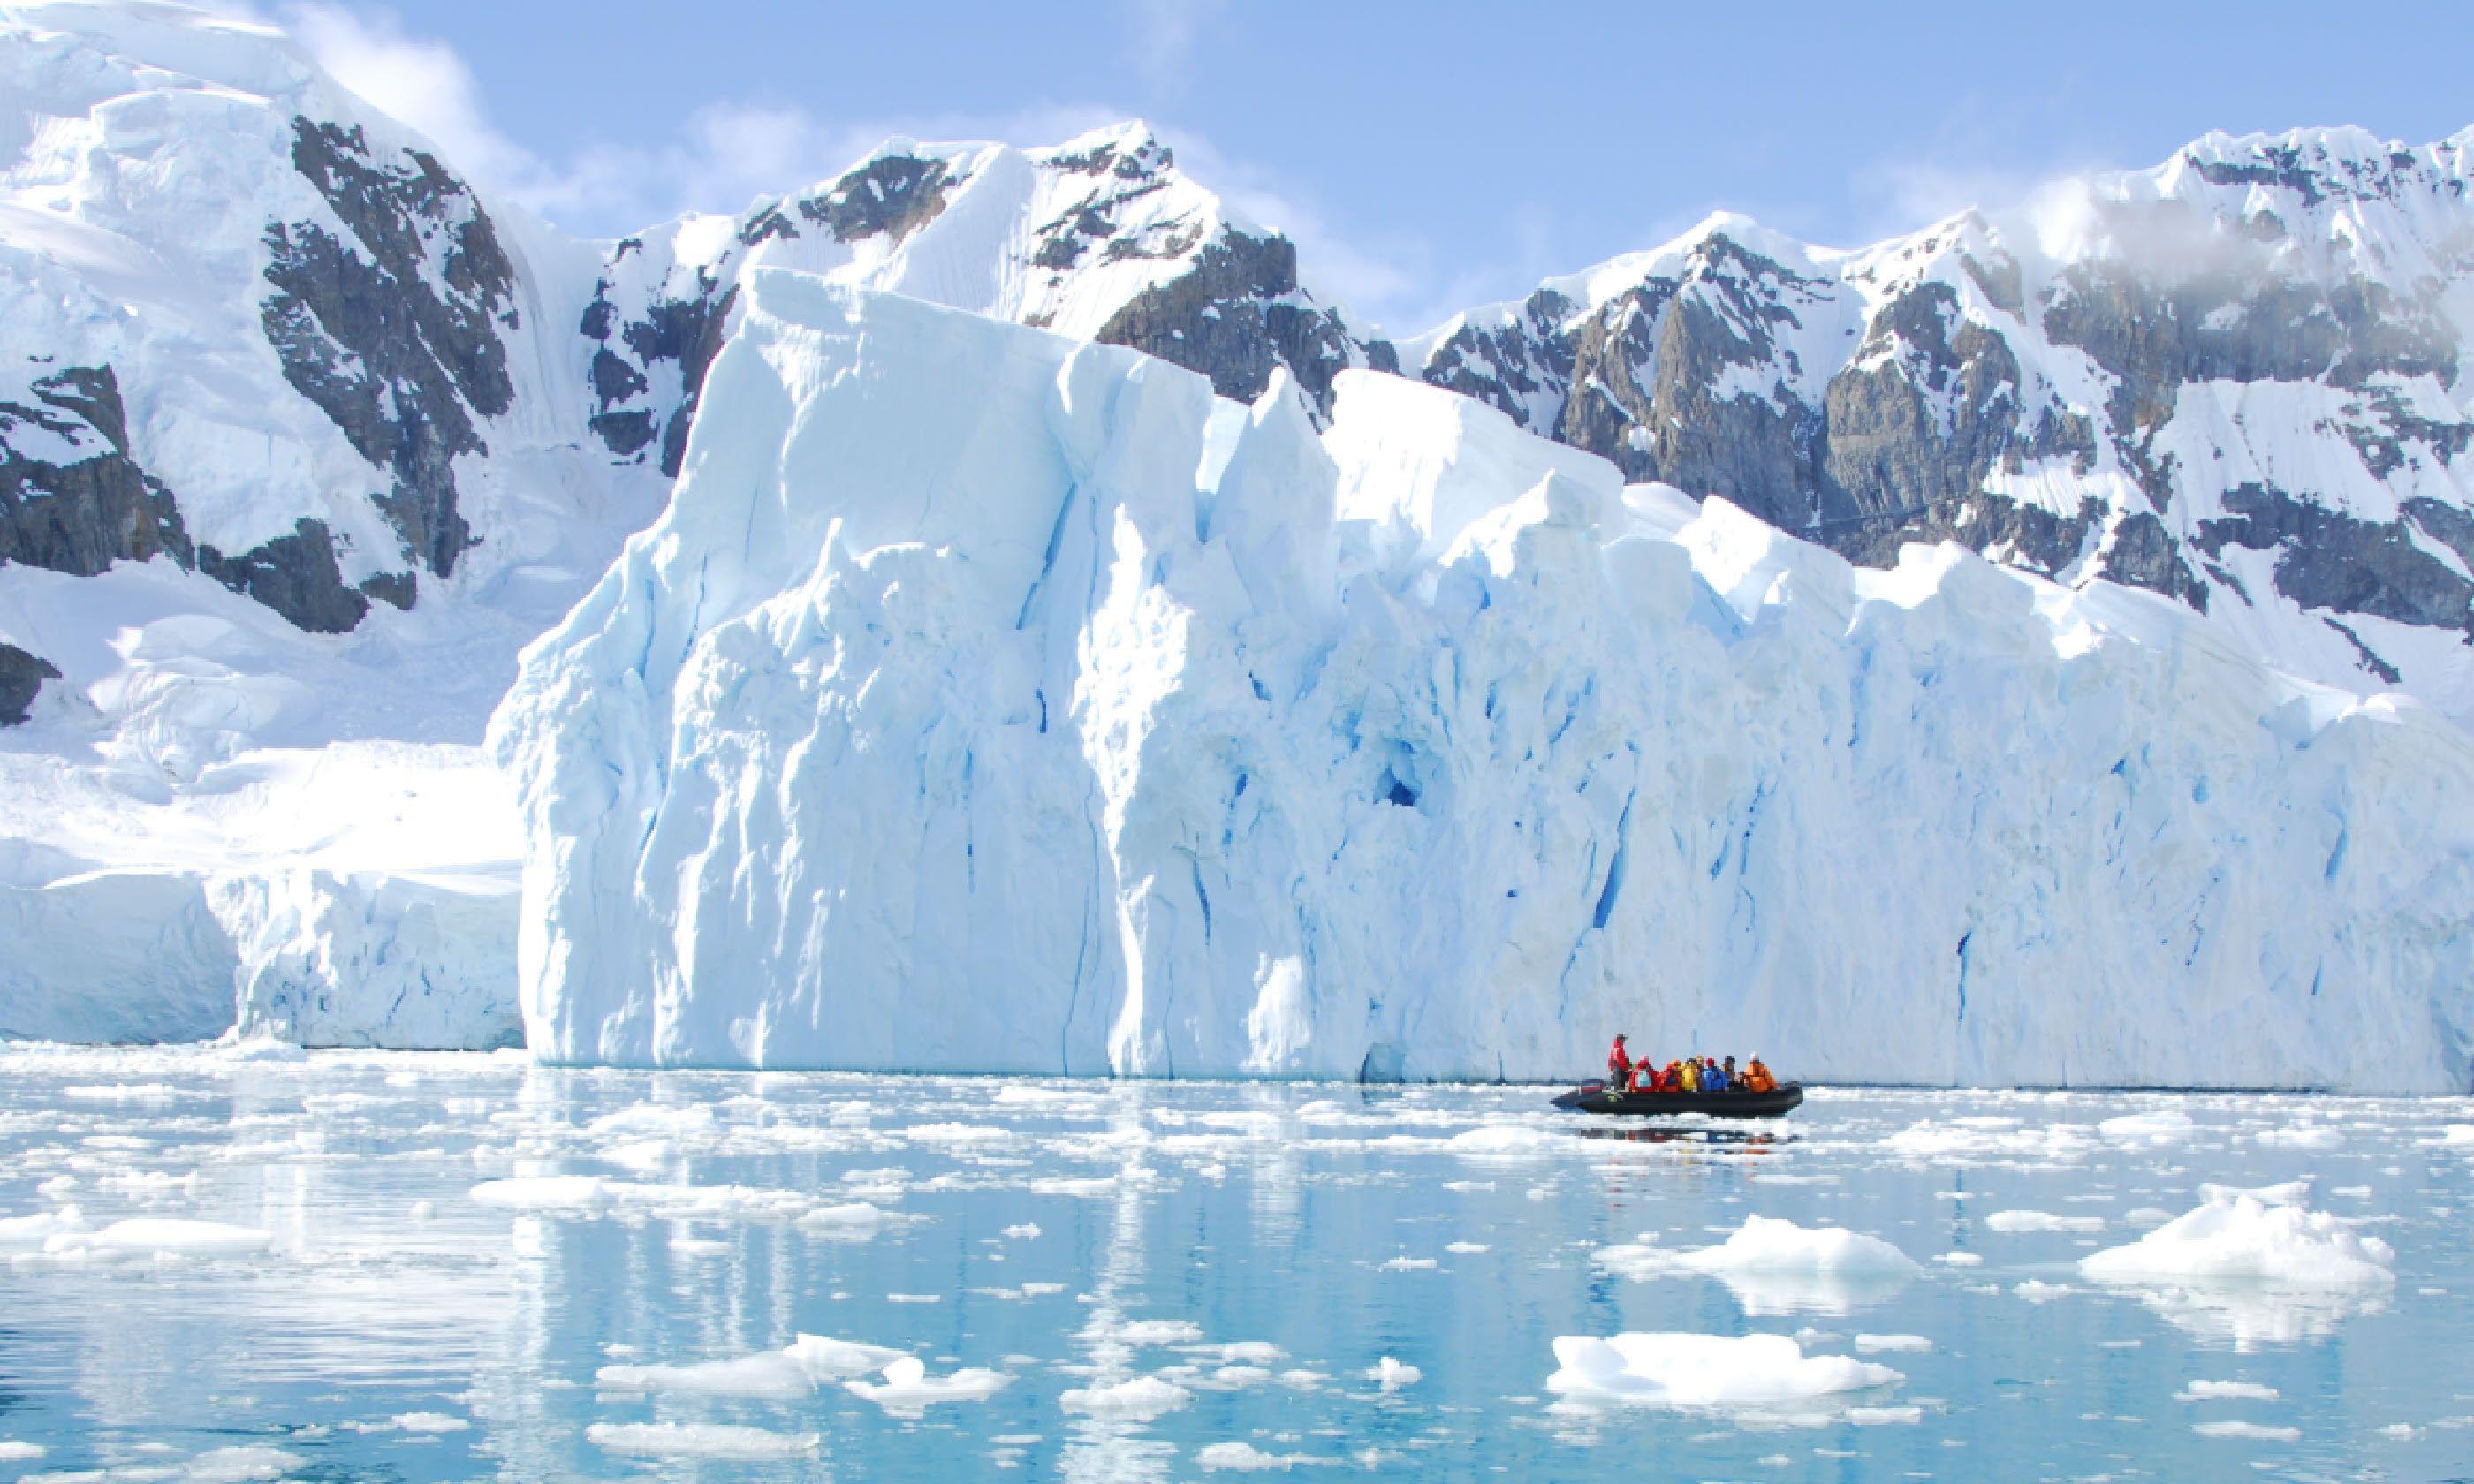 Antarctica: your trip of a lifetime? (Shutterstock)